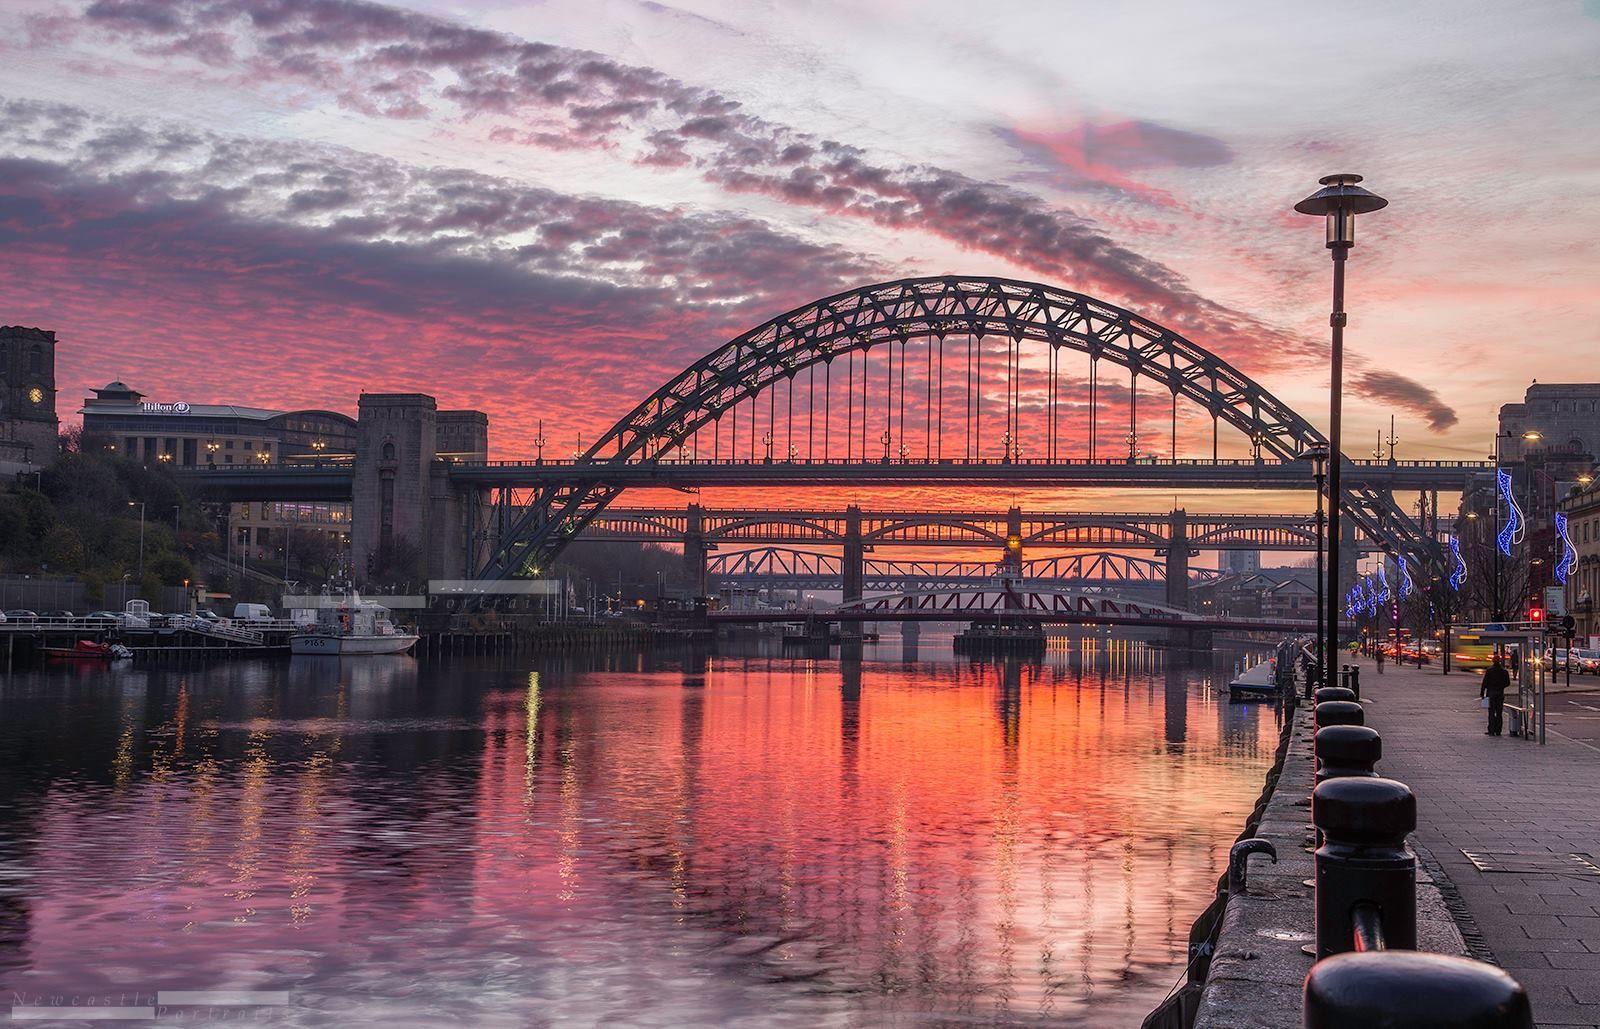 Pin By Jeffrey Lindsay On Bridges Newcastle Newcastle Upon Tyne Photo